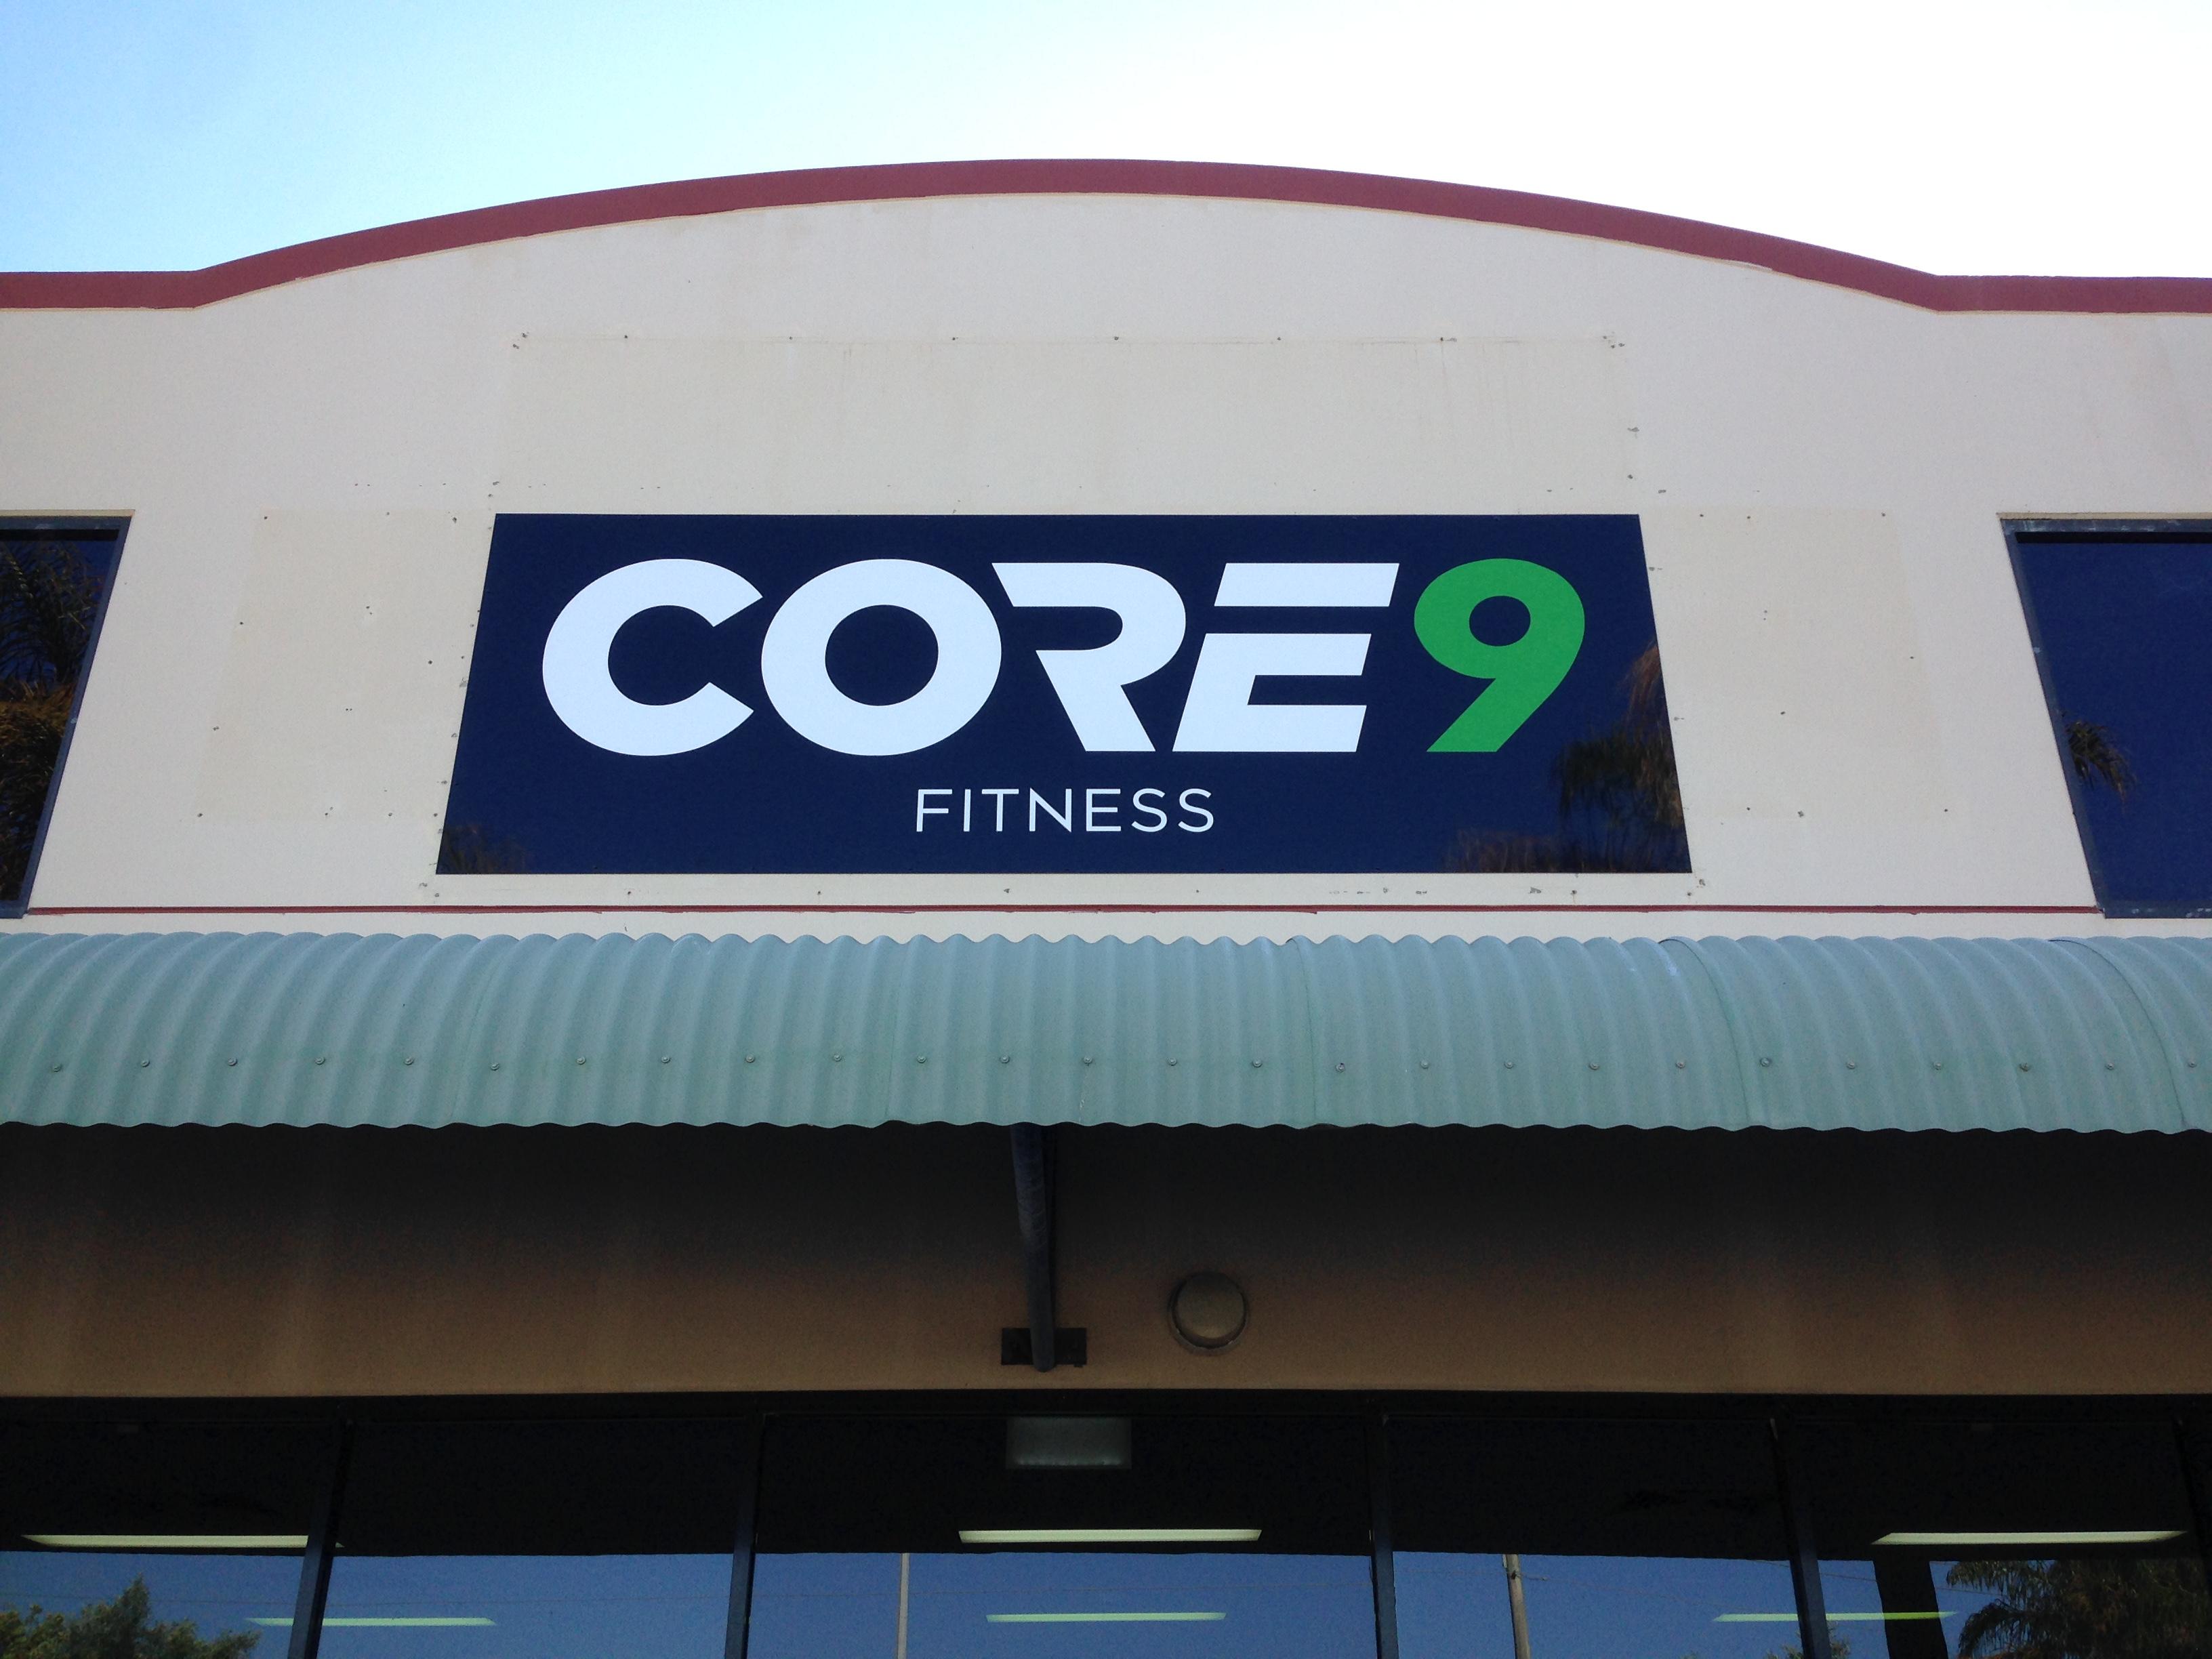 Core 9 Fitness